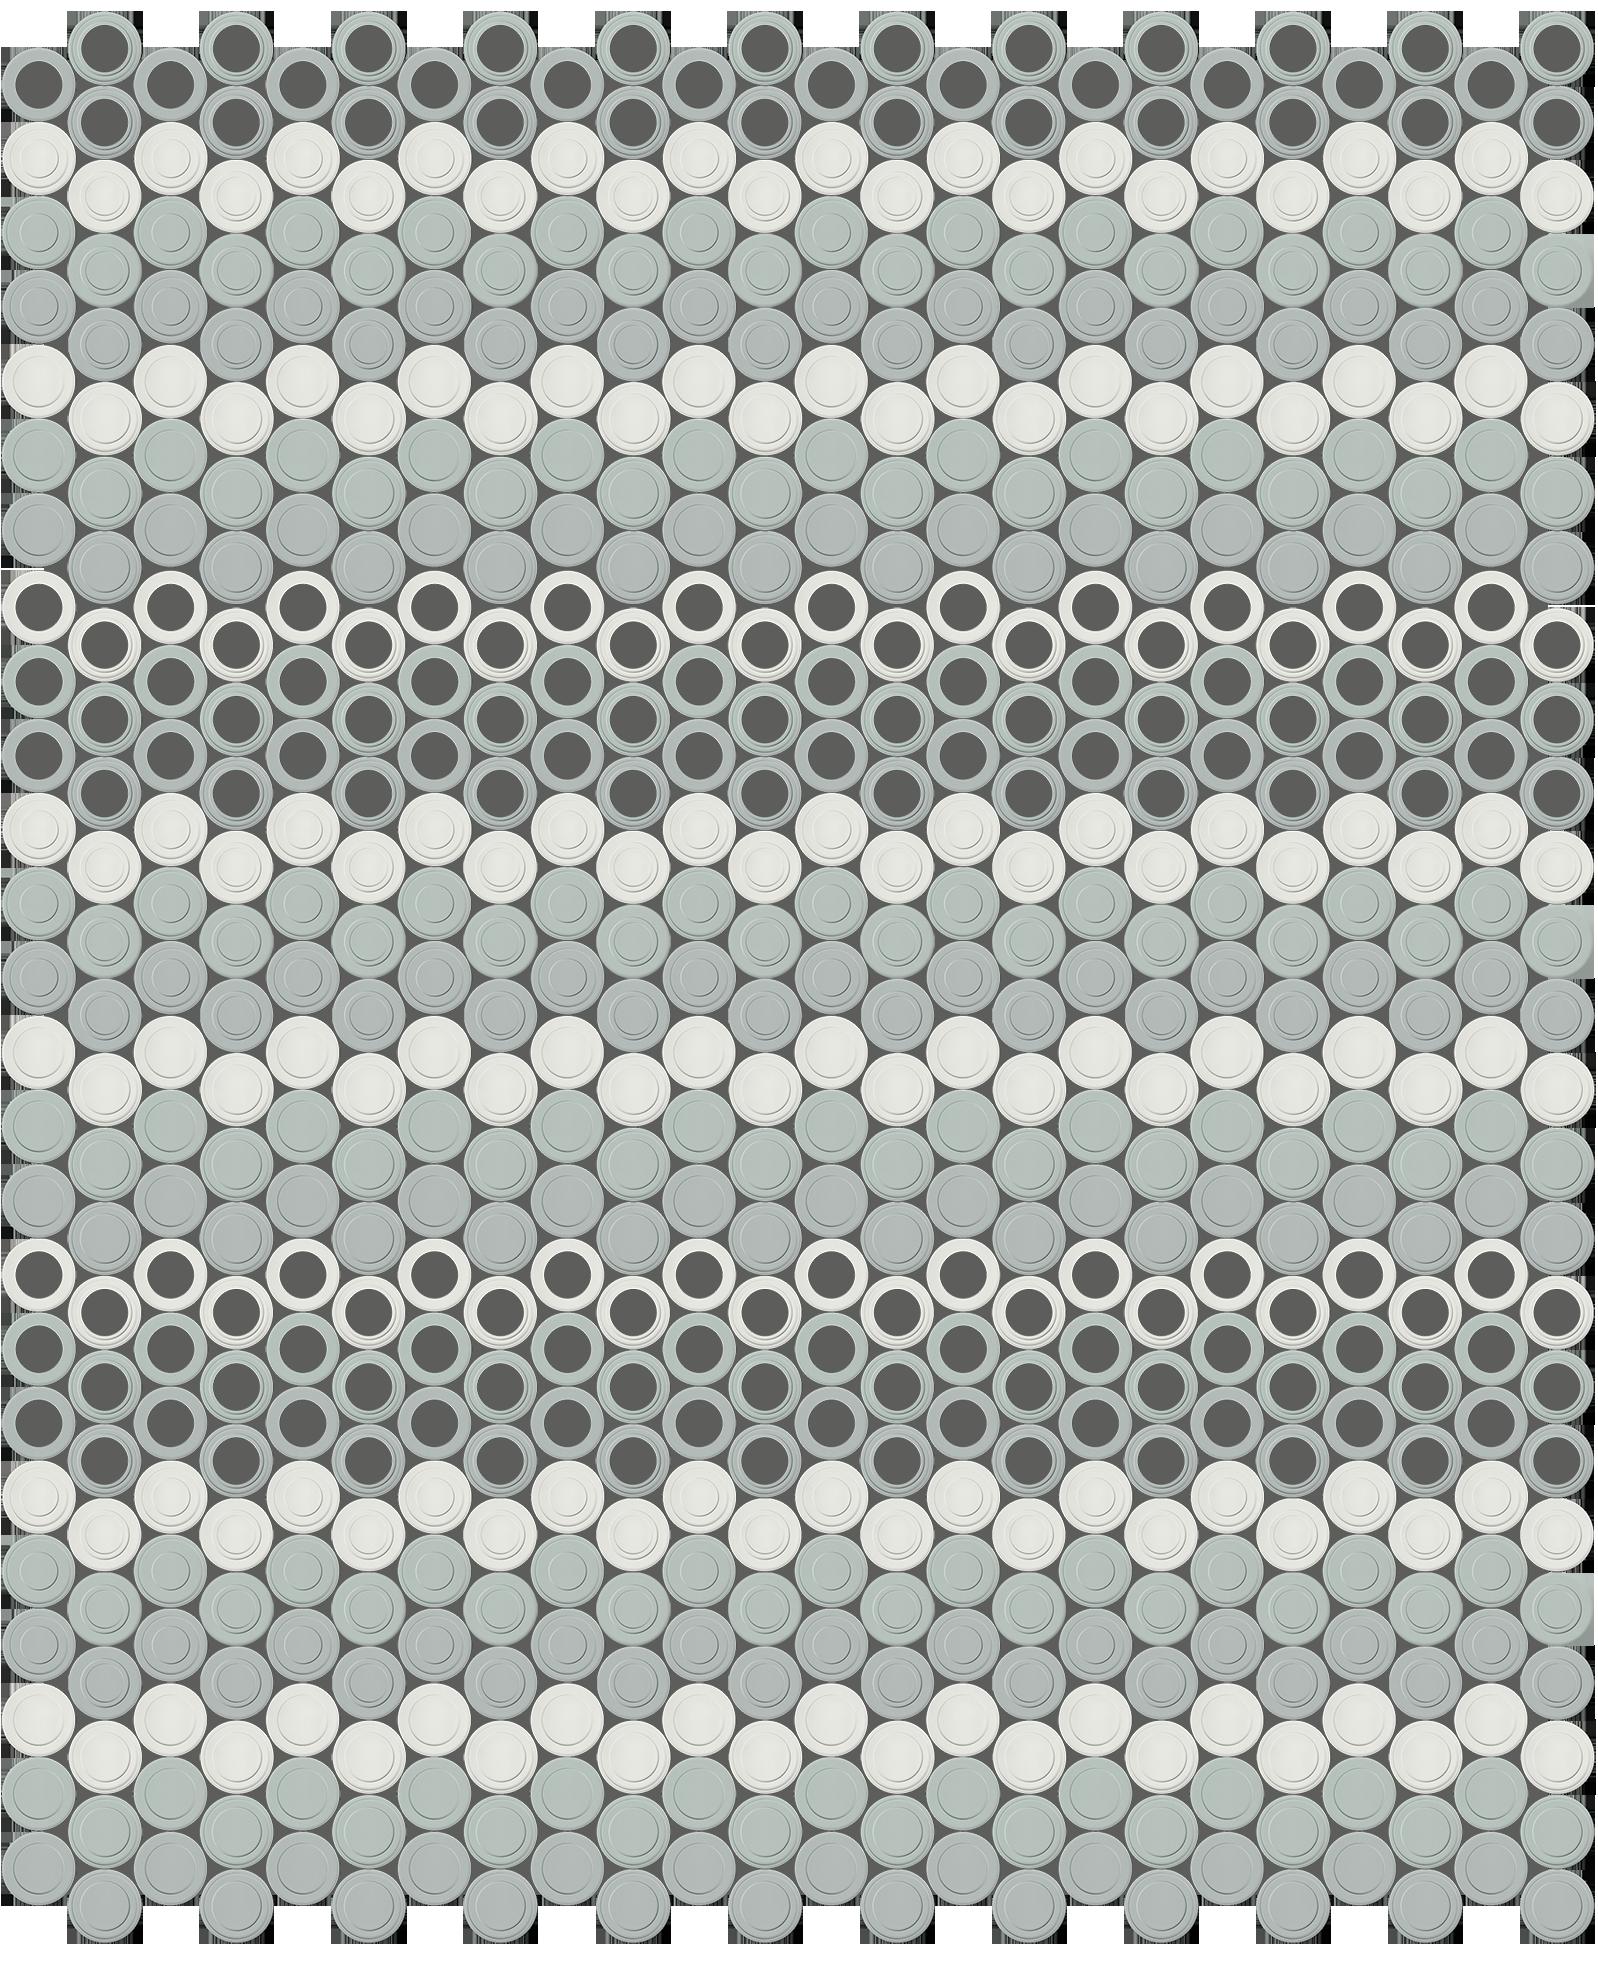 R1-R6 : Pattern C